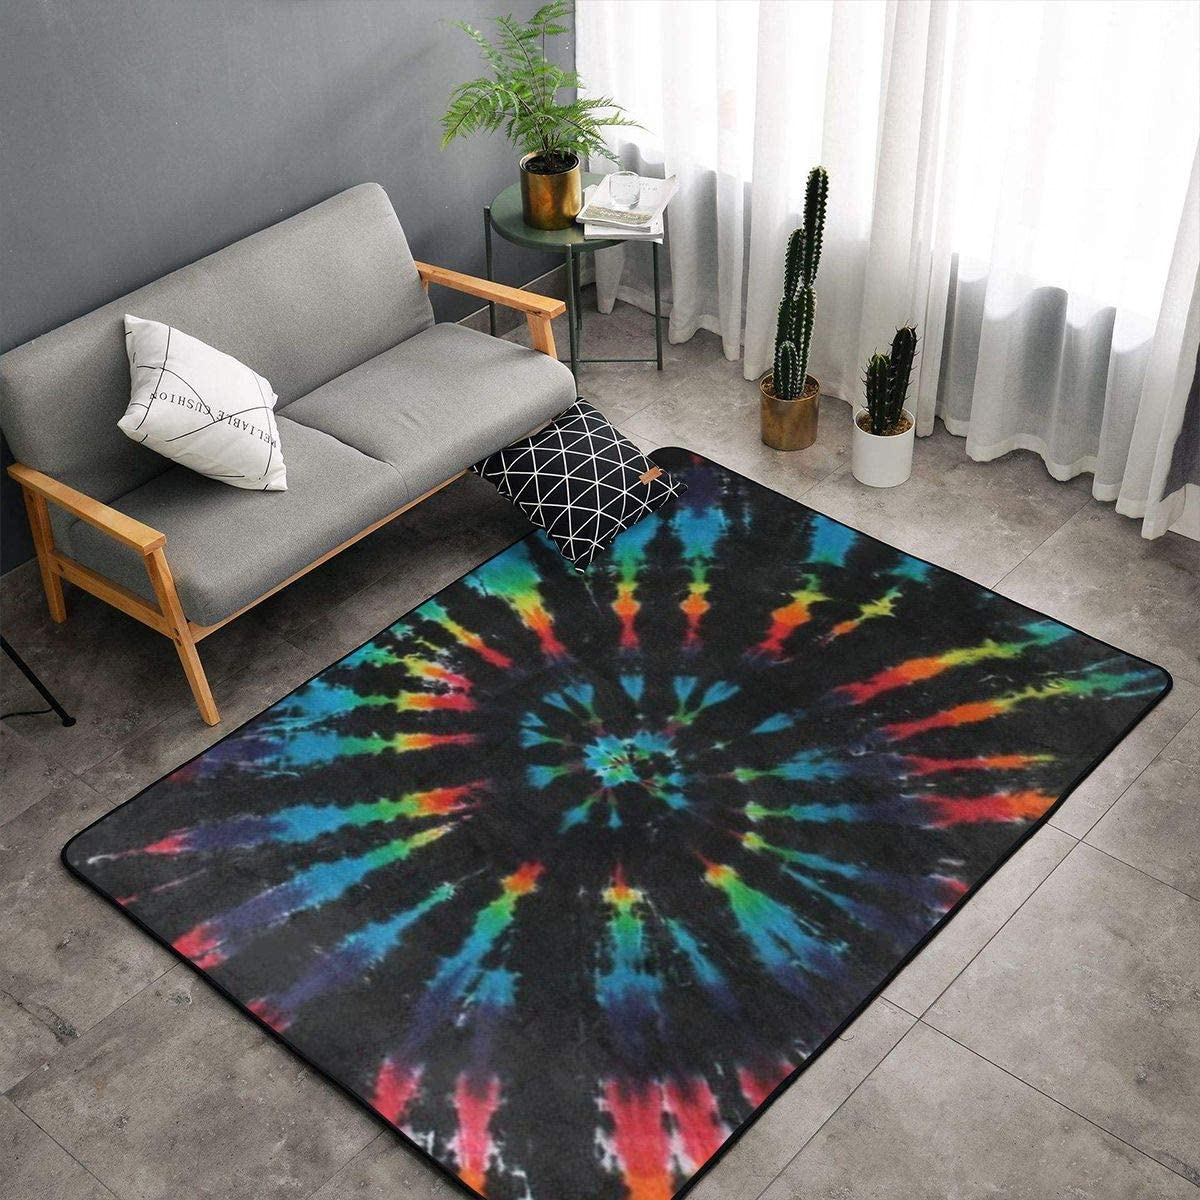 Memory Foam Area Rug for Living Room Playroom Dorm Room, Anti-Slip Backing Floor Pad Rugs Luxurious Throw Rugs Carpet, Ergonomical, Black Tie Dye Shaggy Rugs